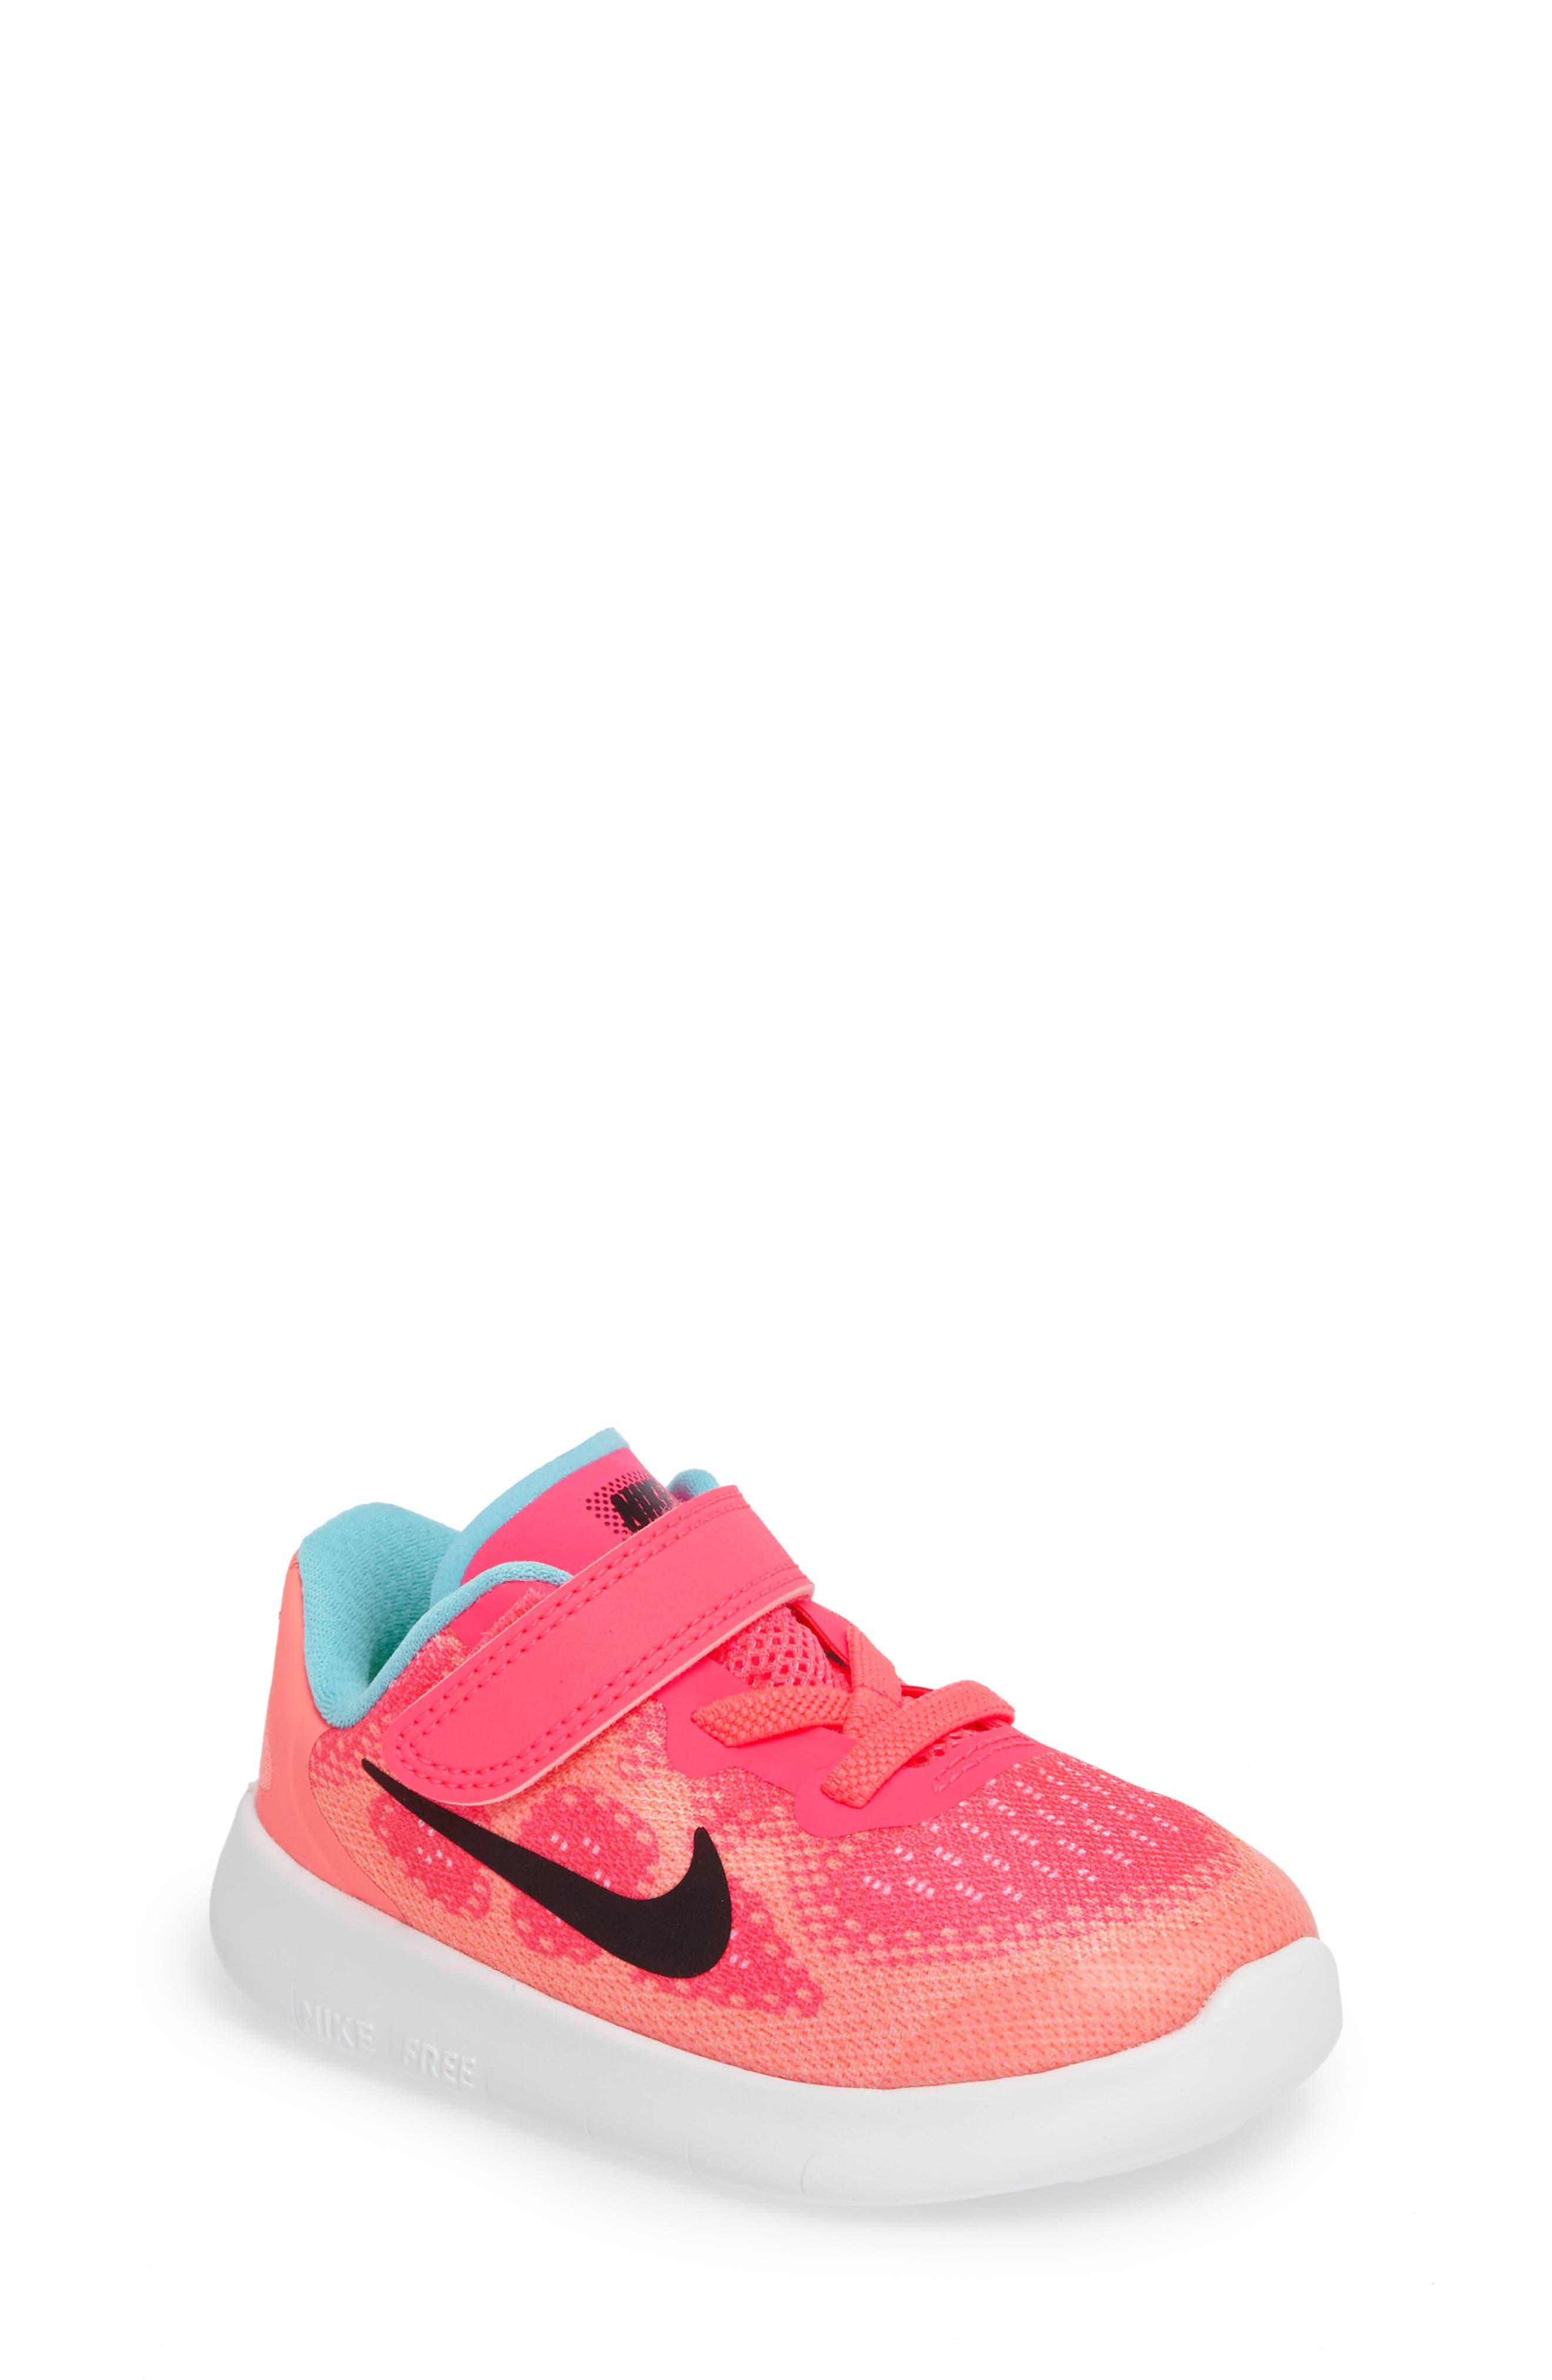 Free Run 2017 Sneaker,                             Main thumbnail 4, color,